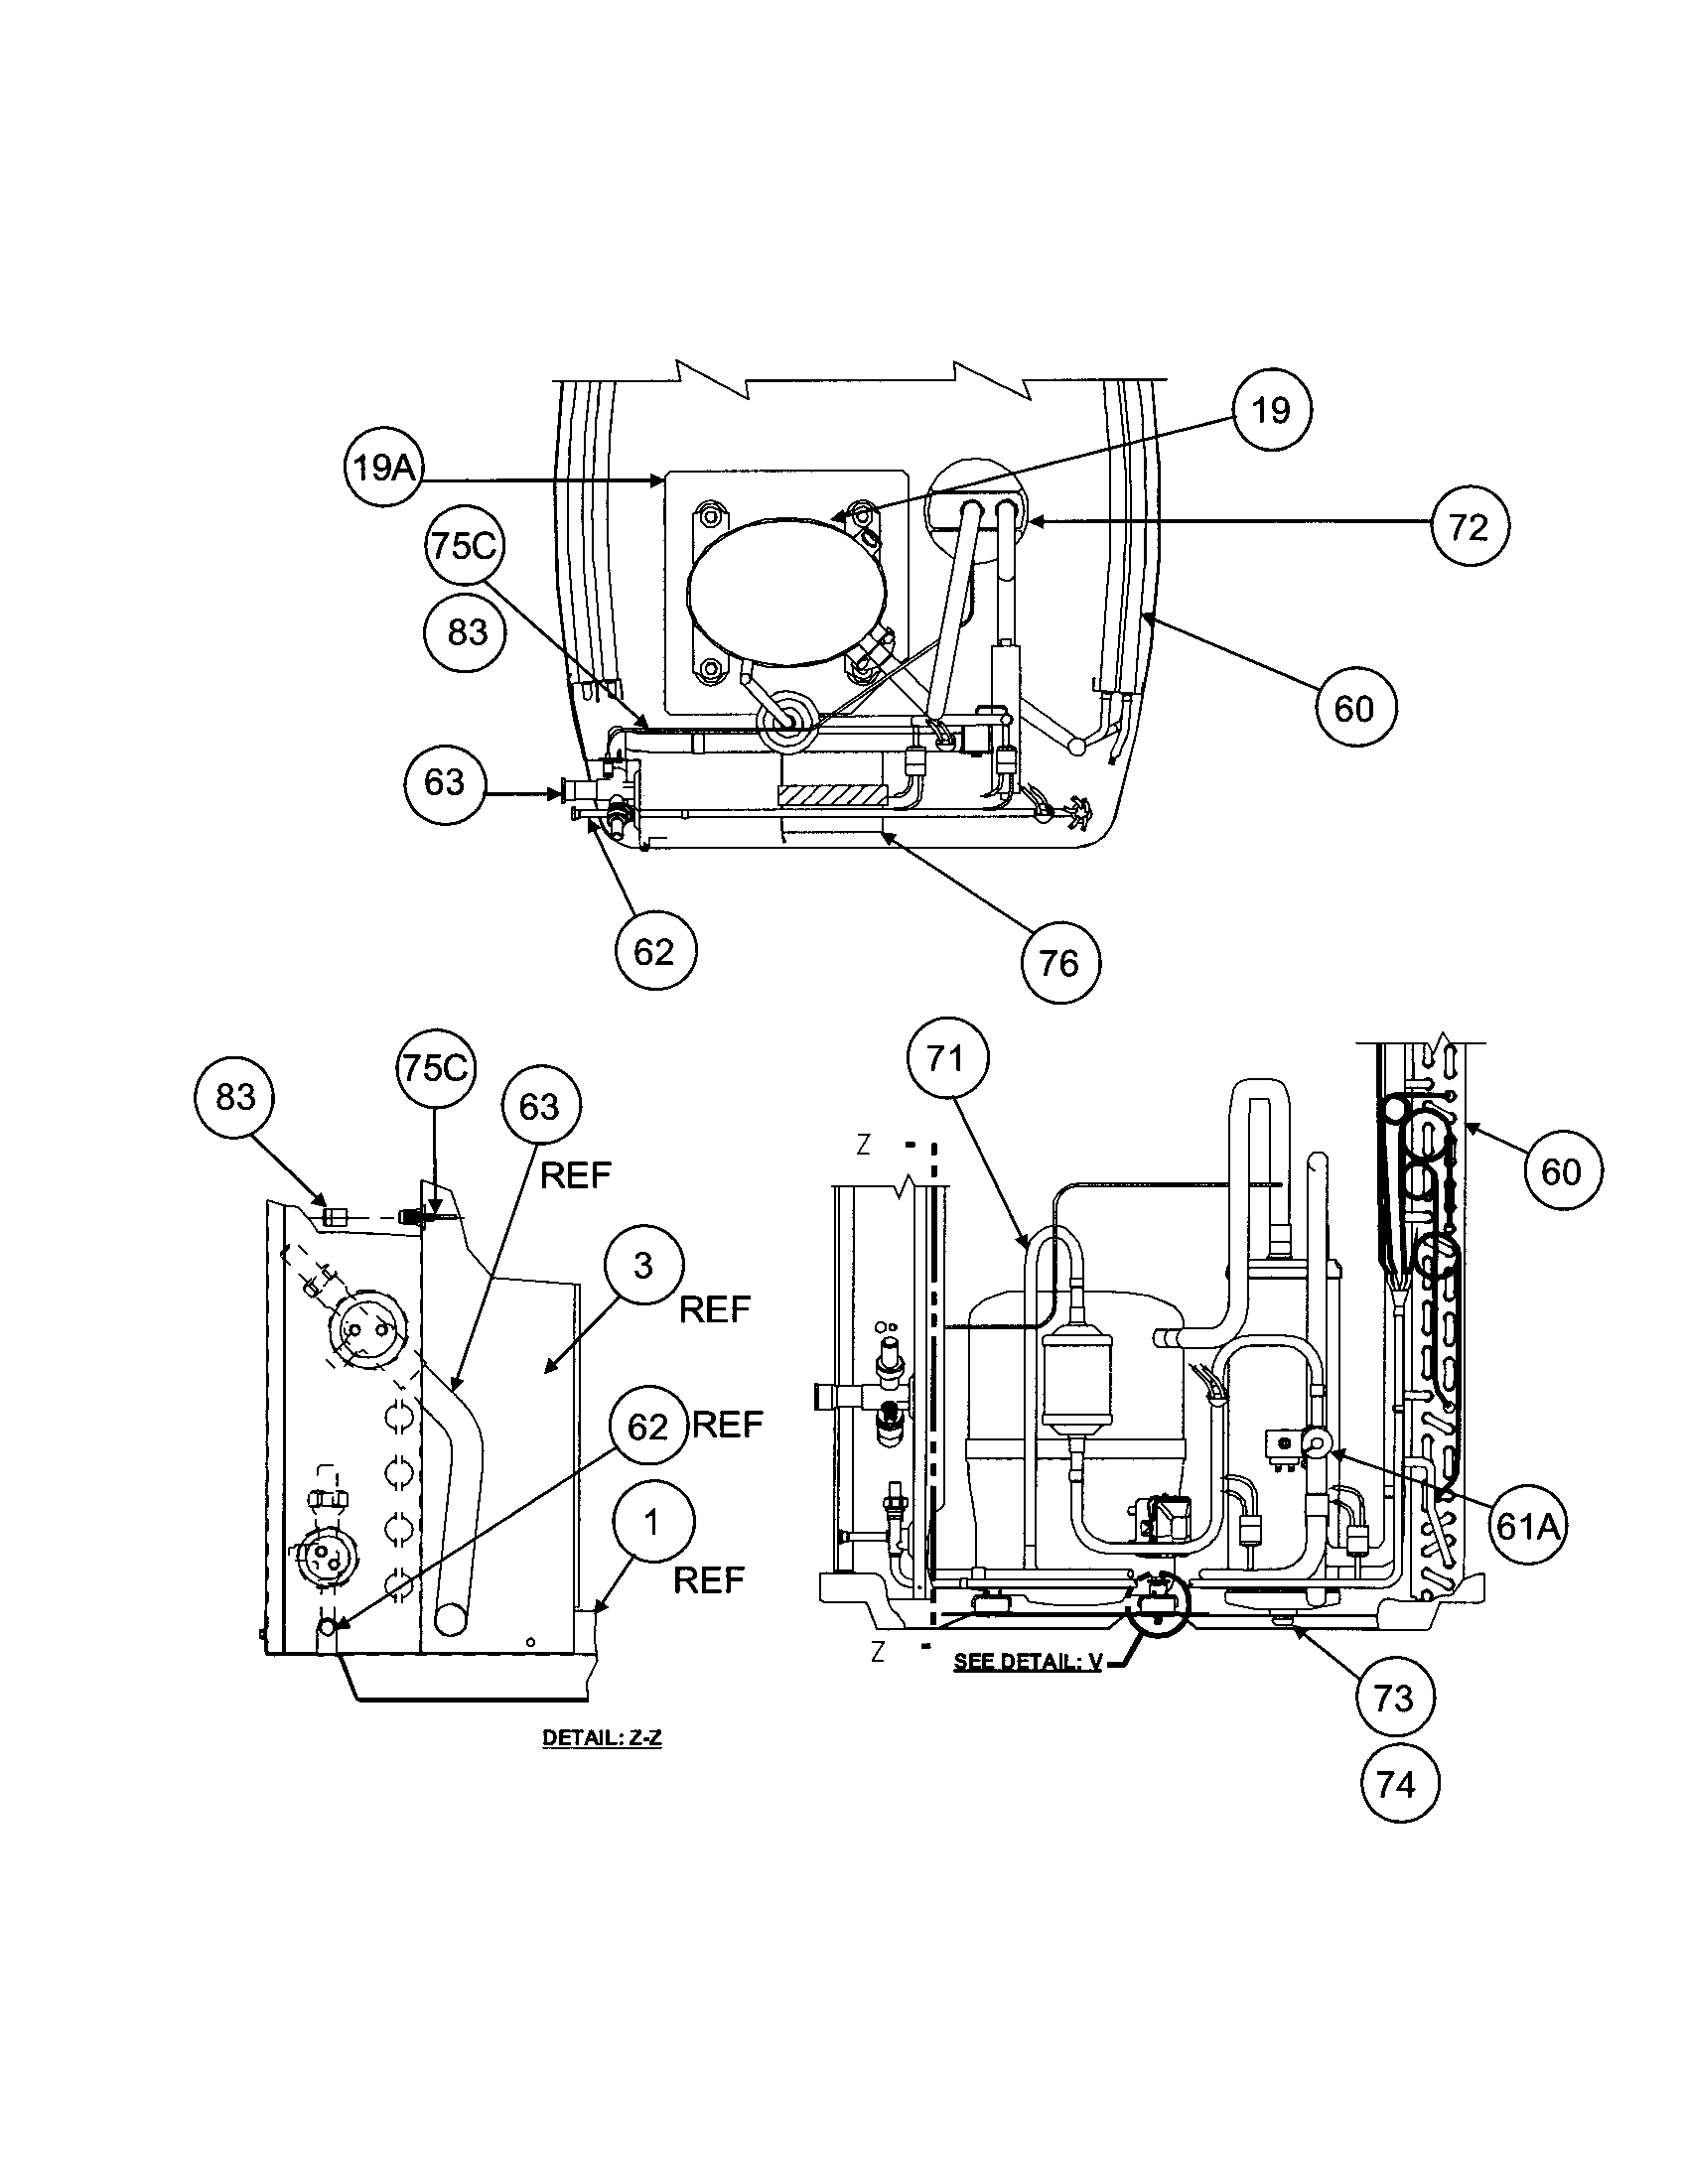 Heat Pump: Carrier Heat Pump Parts